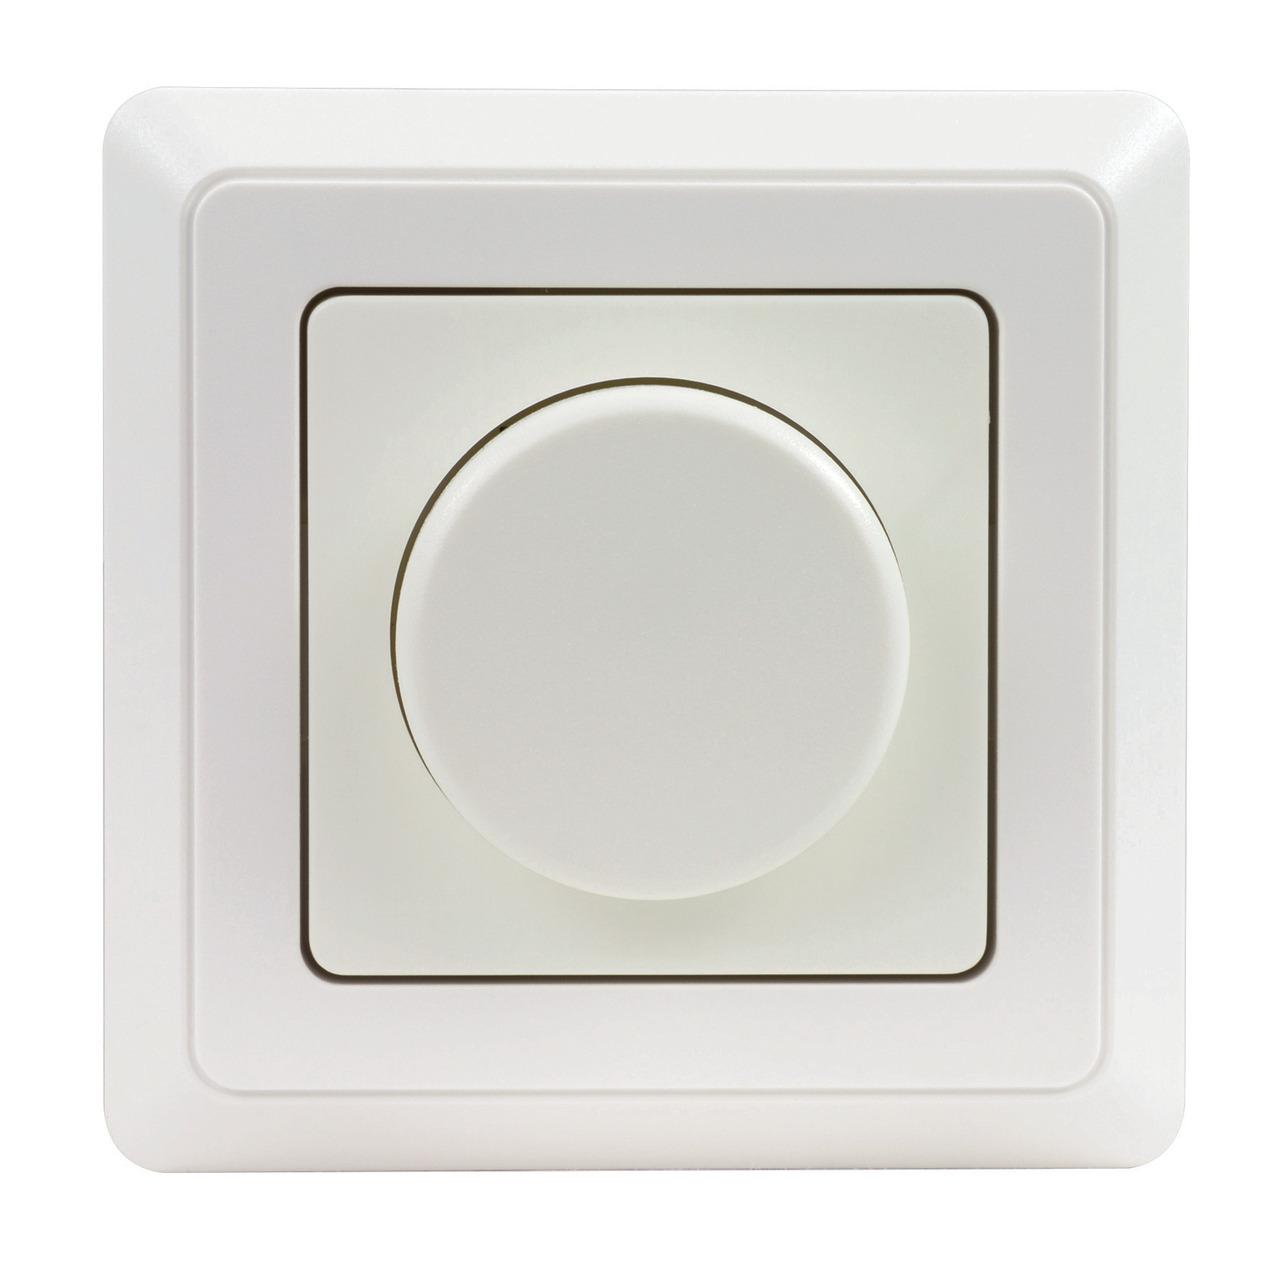 REV LED-Dimmer inkl- Rahmen- Phasenabschnitt- nur 5 W Mindestlast- Einbaumass 50 x 50 mm